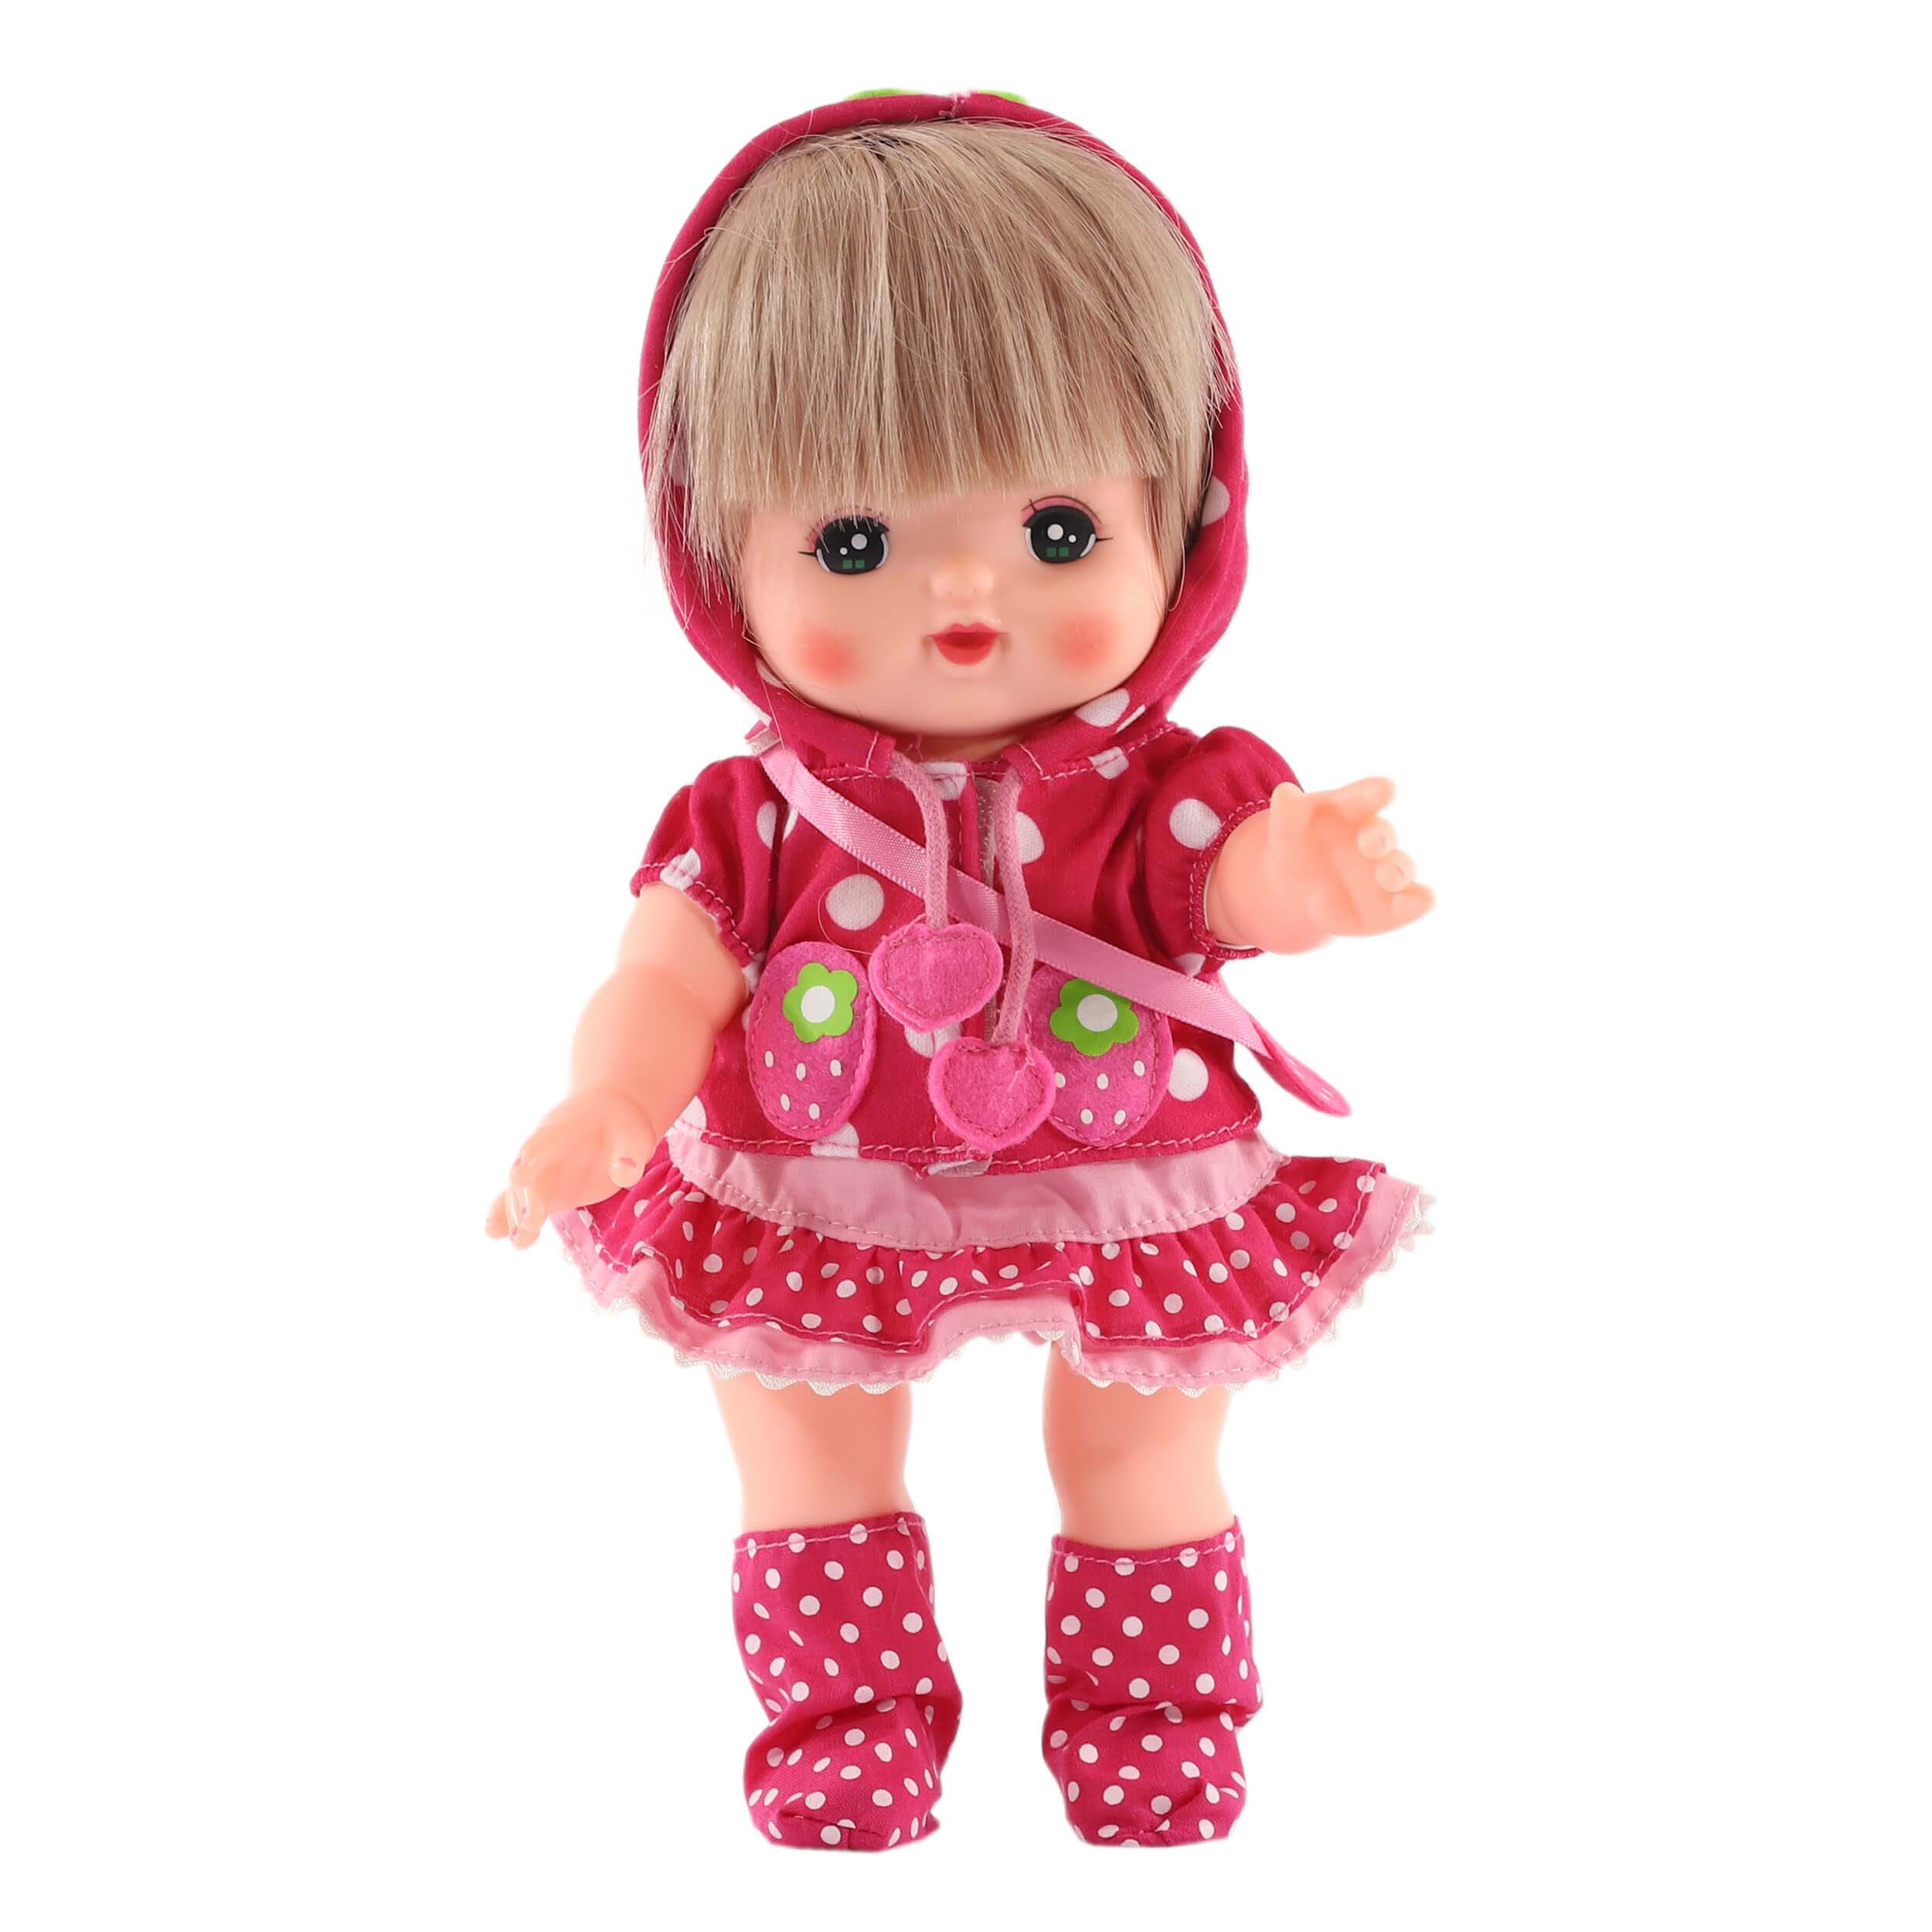 Комплект одежды Клубничка для куклы Мелл